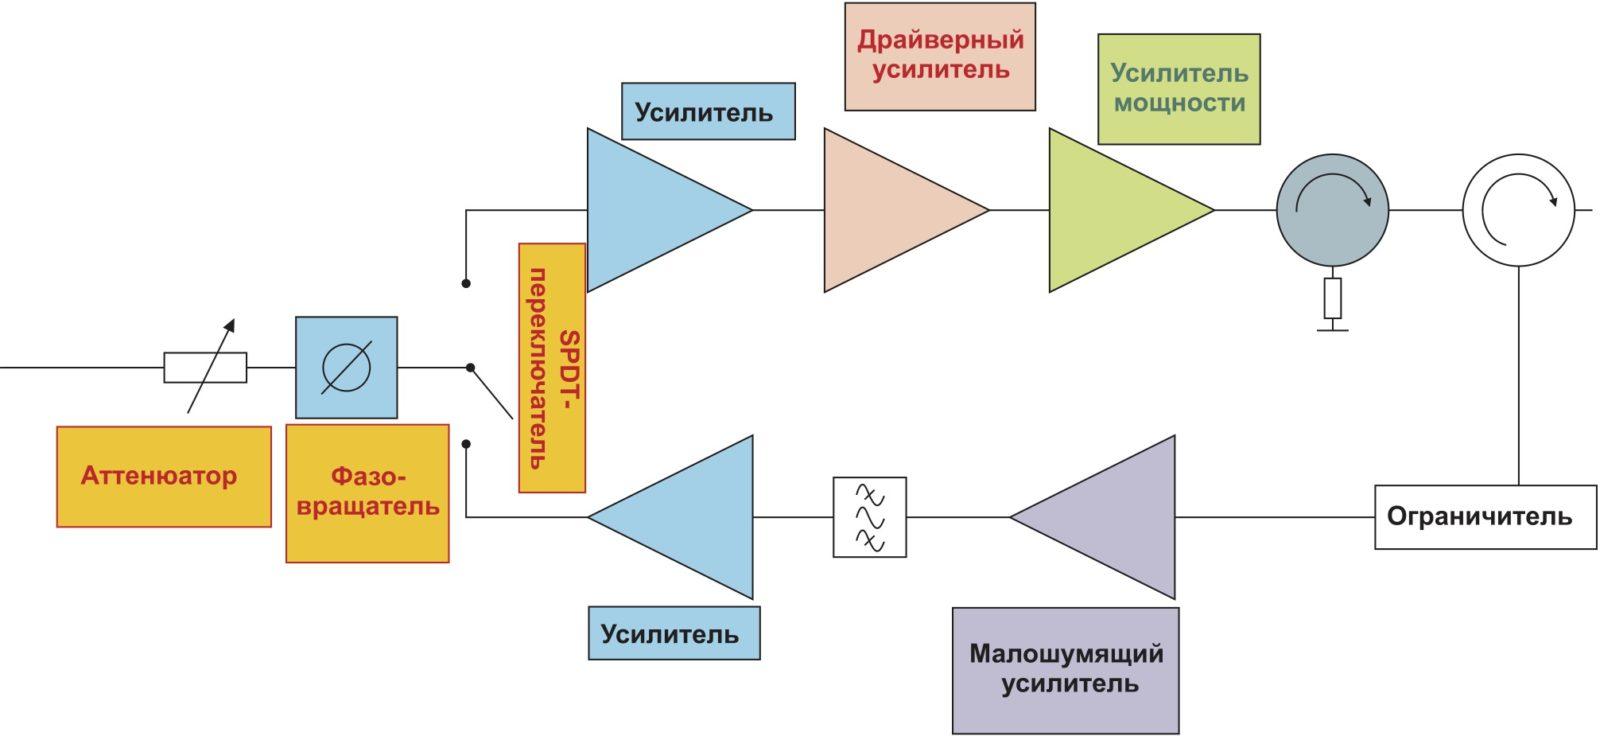 Типовая схема ППМ (приемопередающий модуль АФАР)